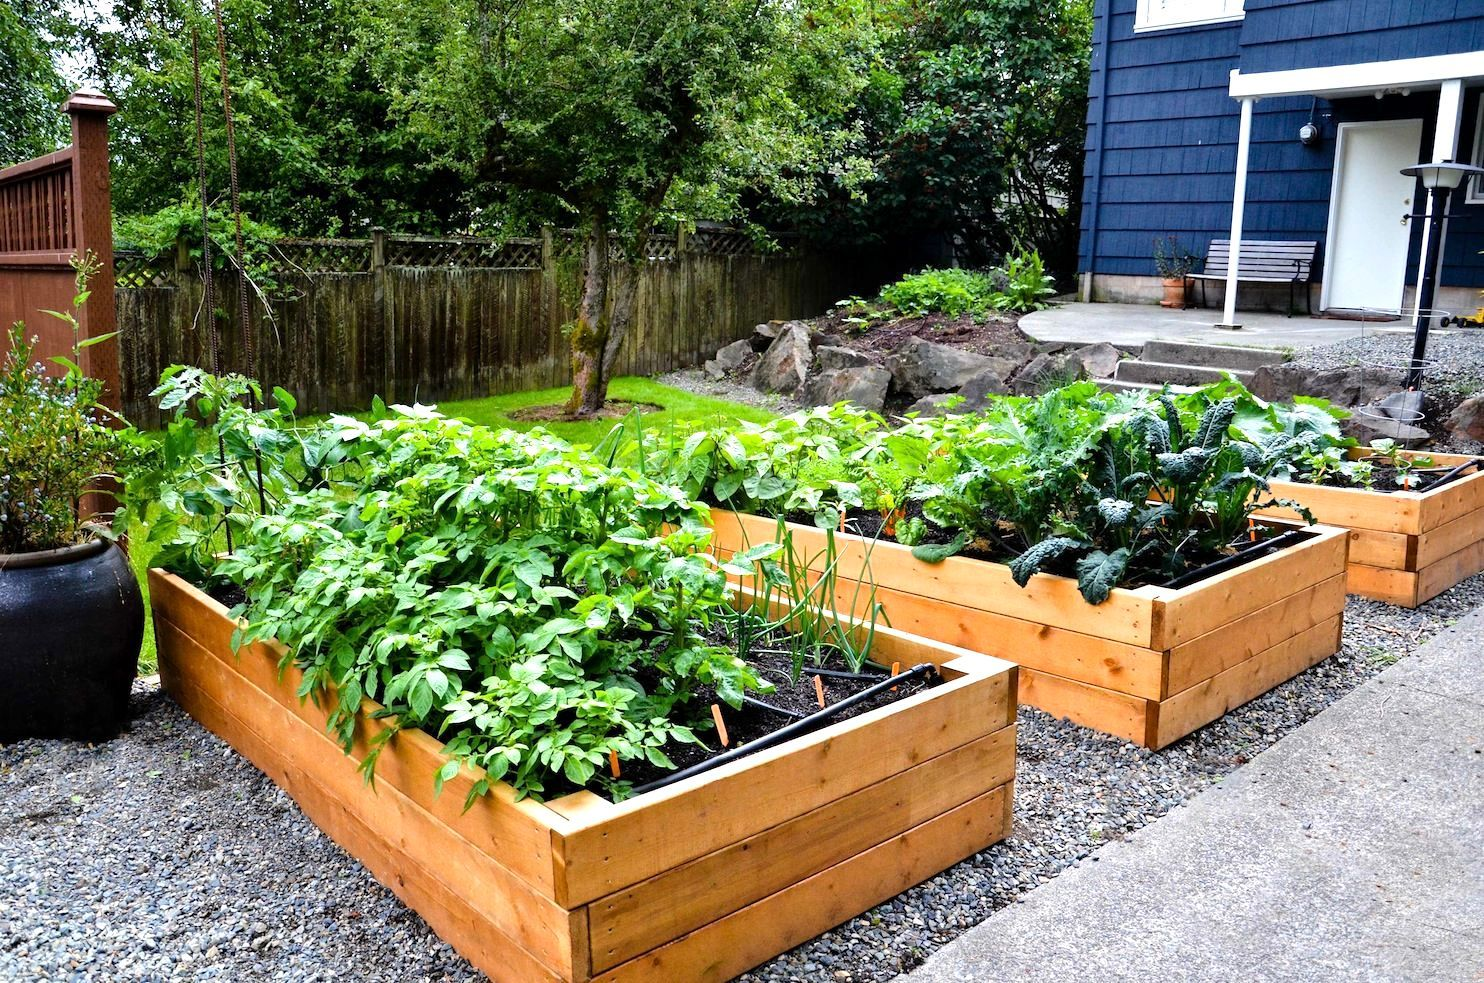 Vegetable Garden Plans For Raised Beds Raised Bed